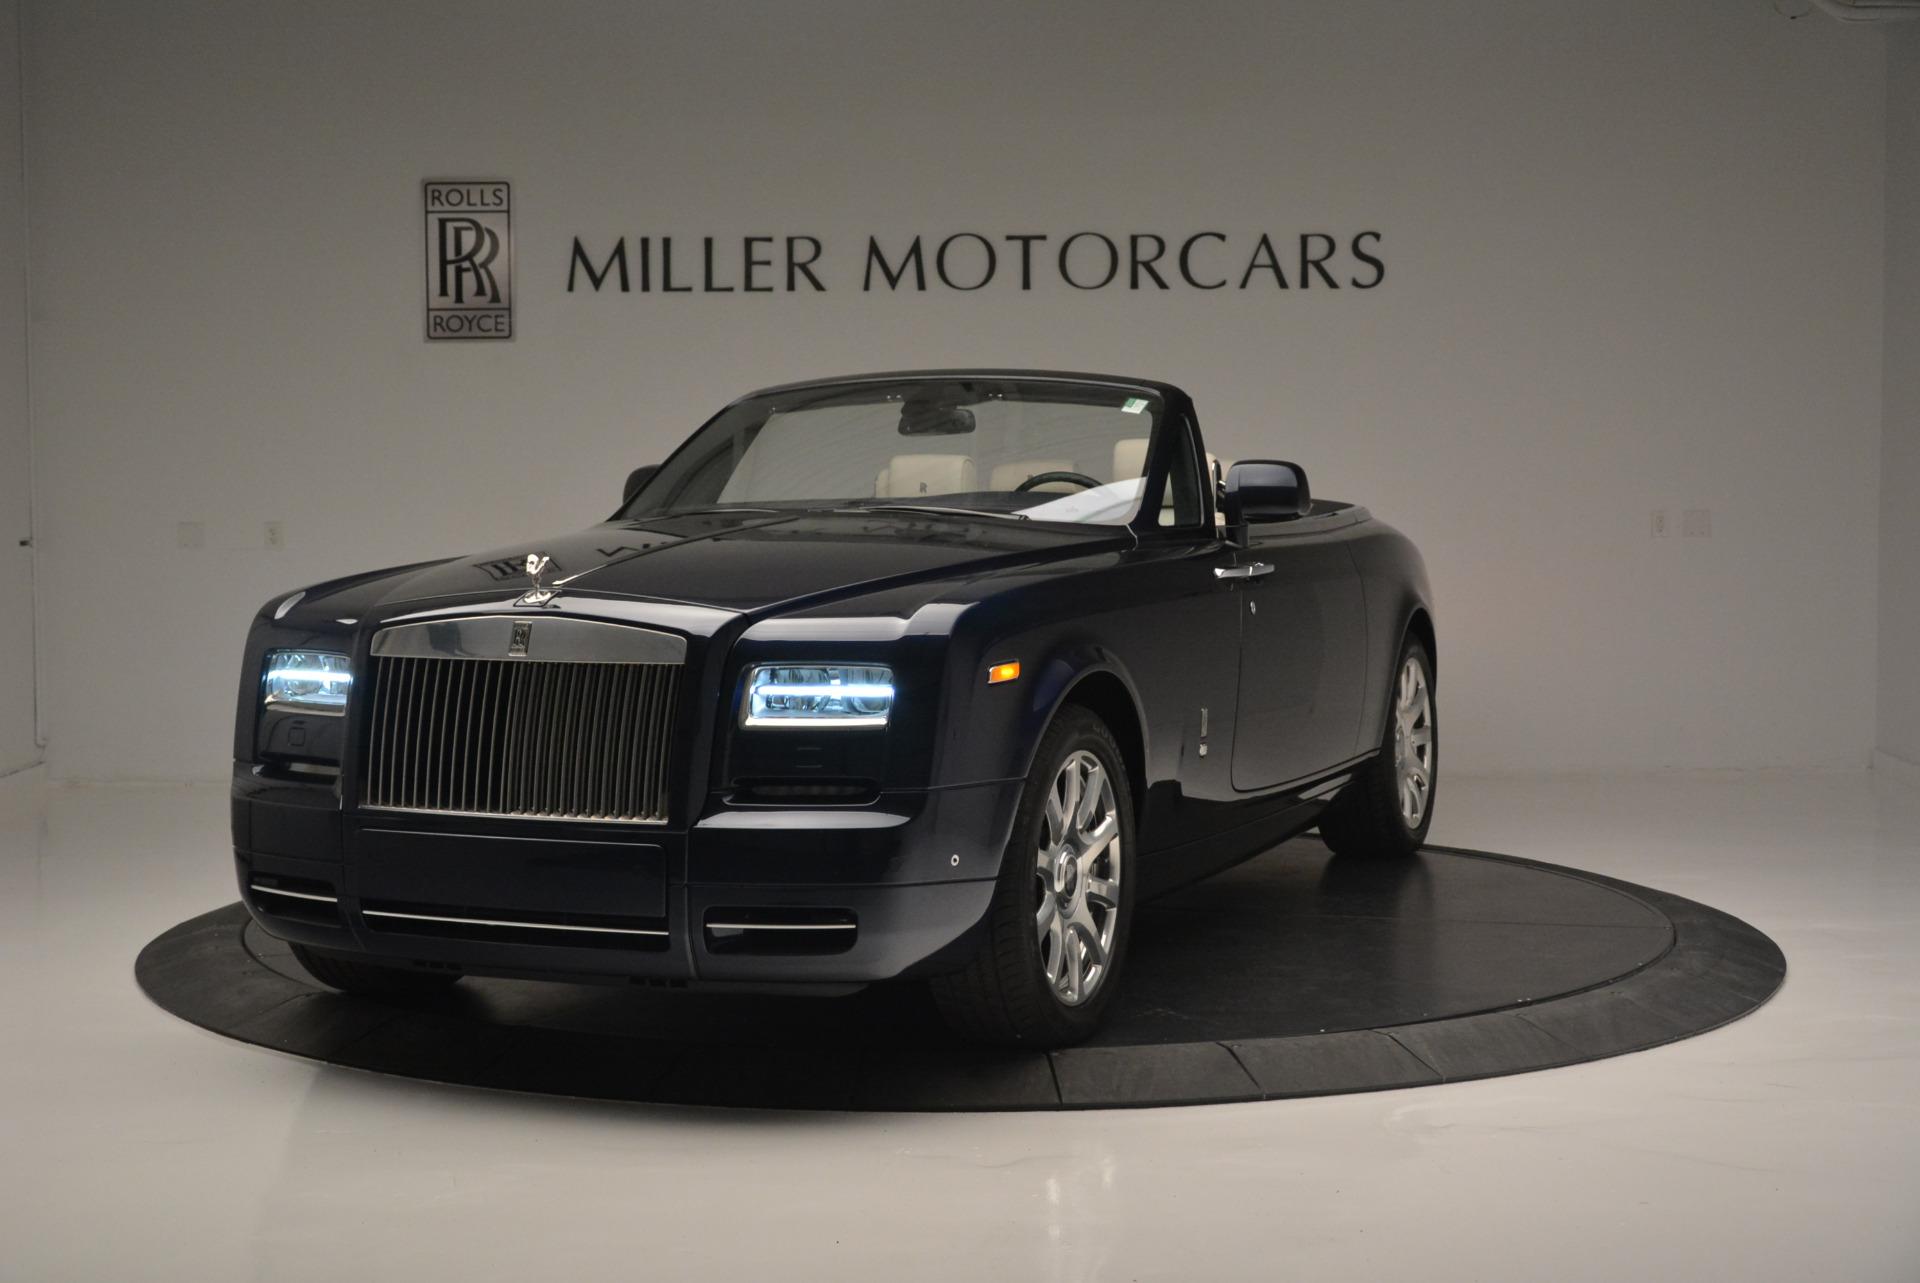 Used 2014 Rolls-Royce Phantom Drophead Coupe for sale Sold at Maserati of Westport in Westport CT 06880 1